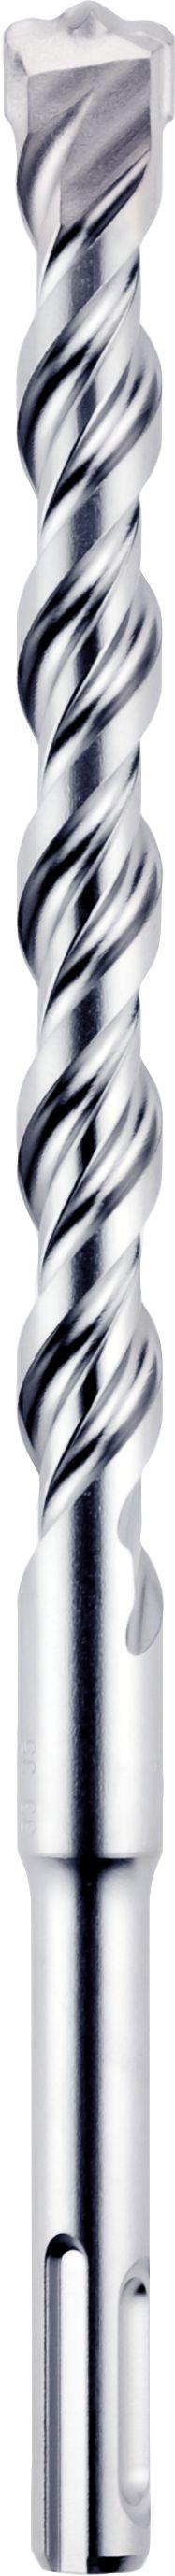 Slika BORER Rocket 3 SDS-plus 14x210 mm